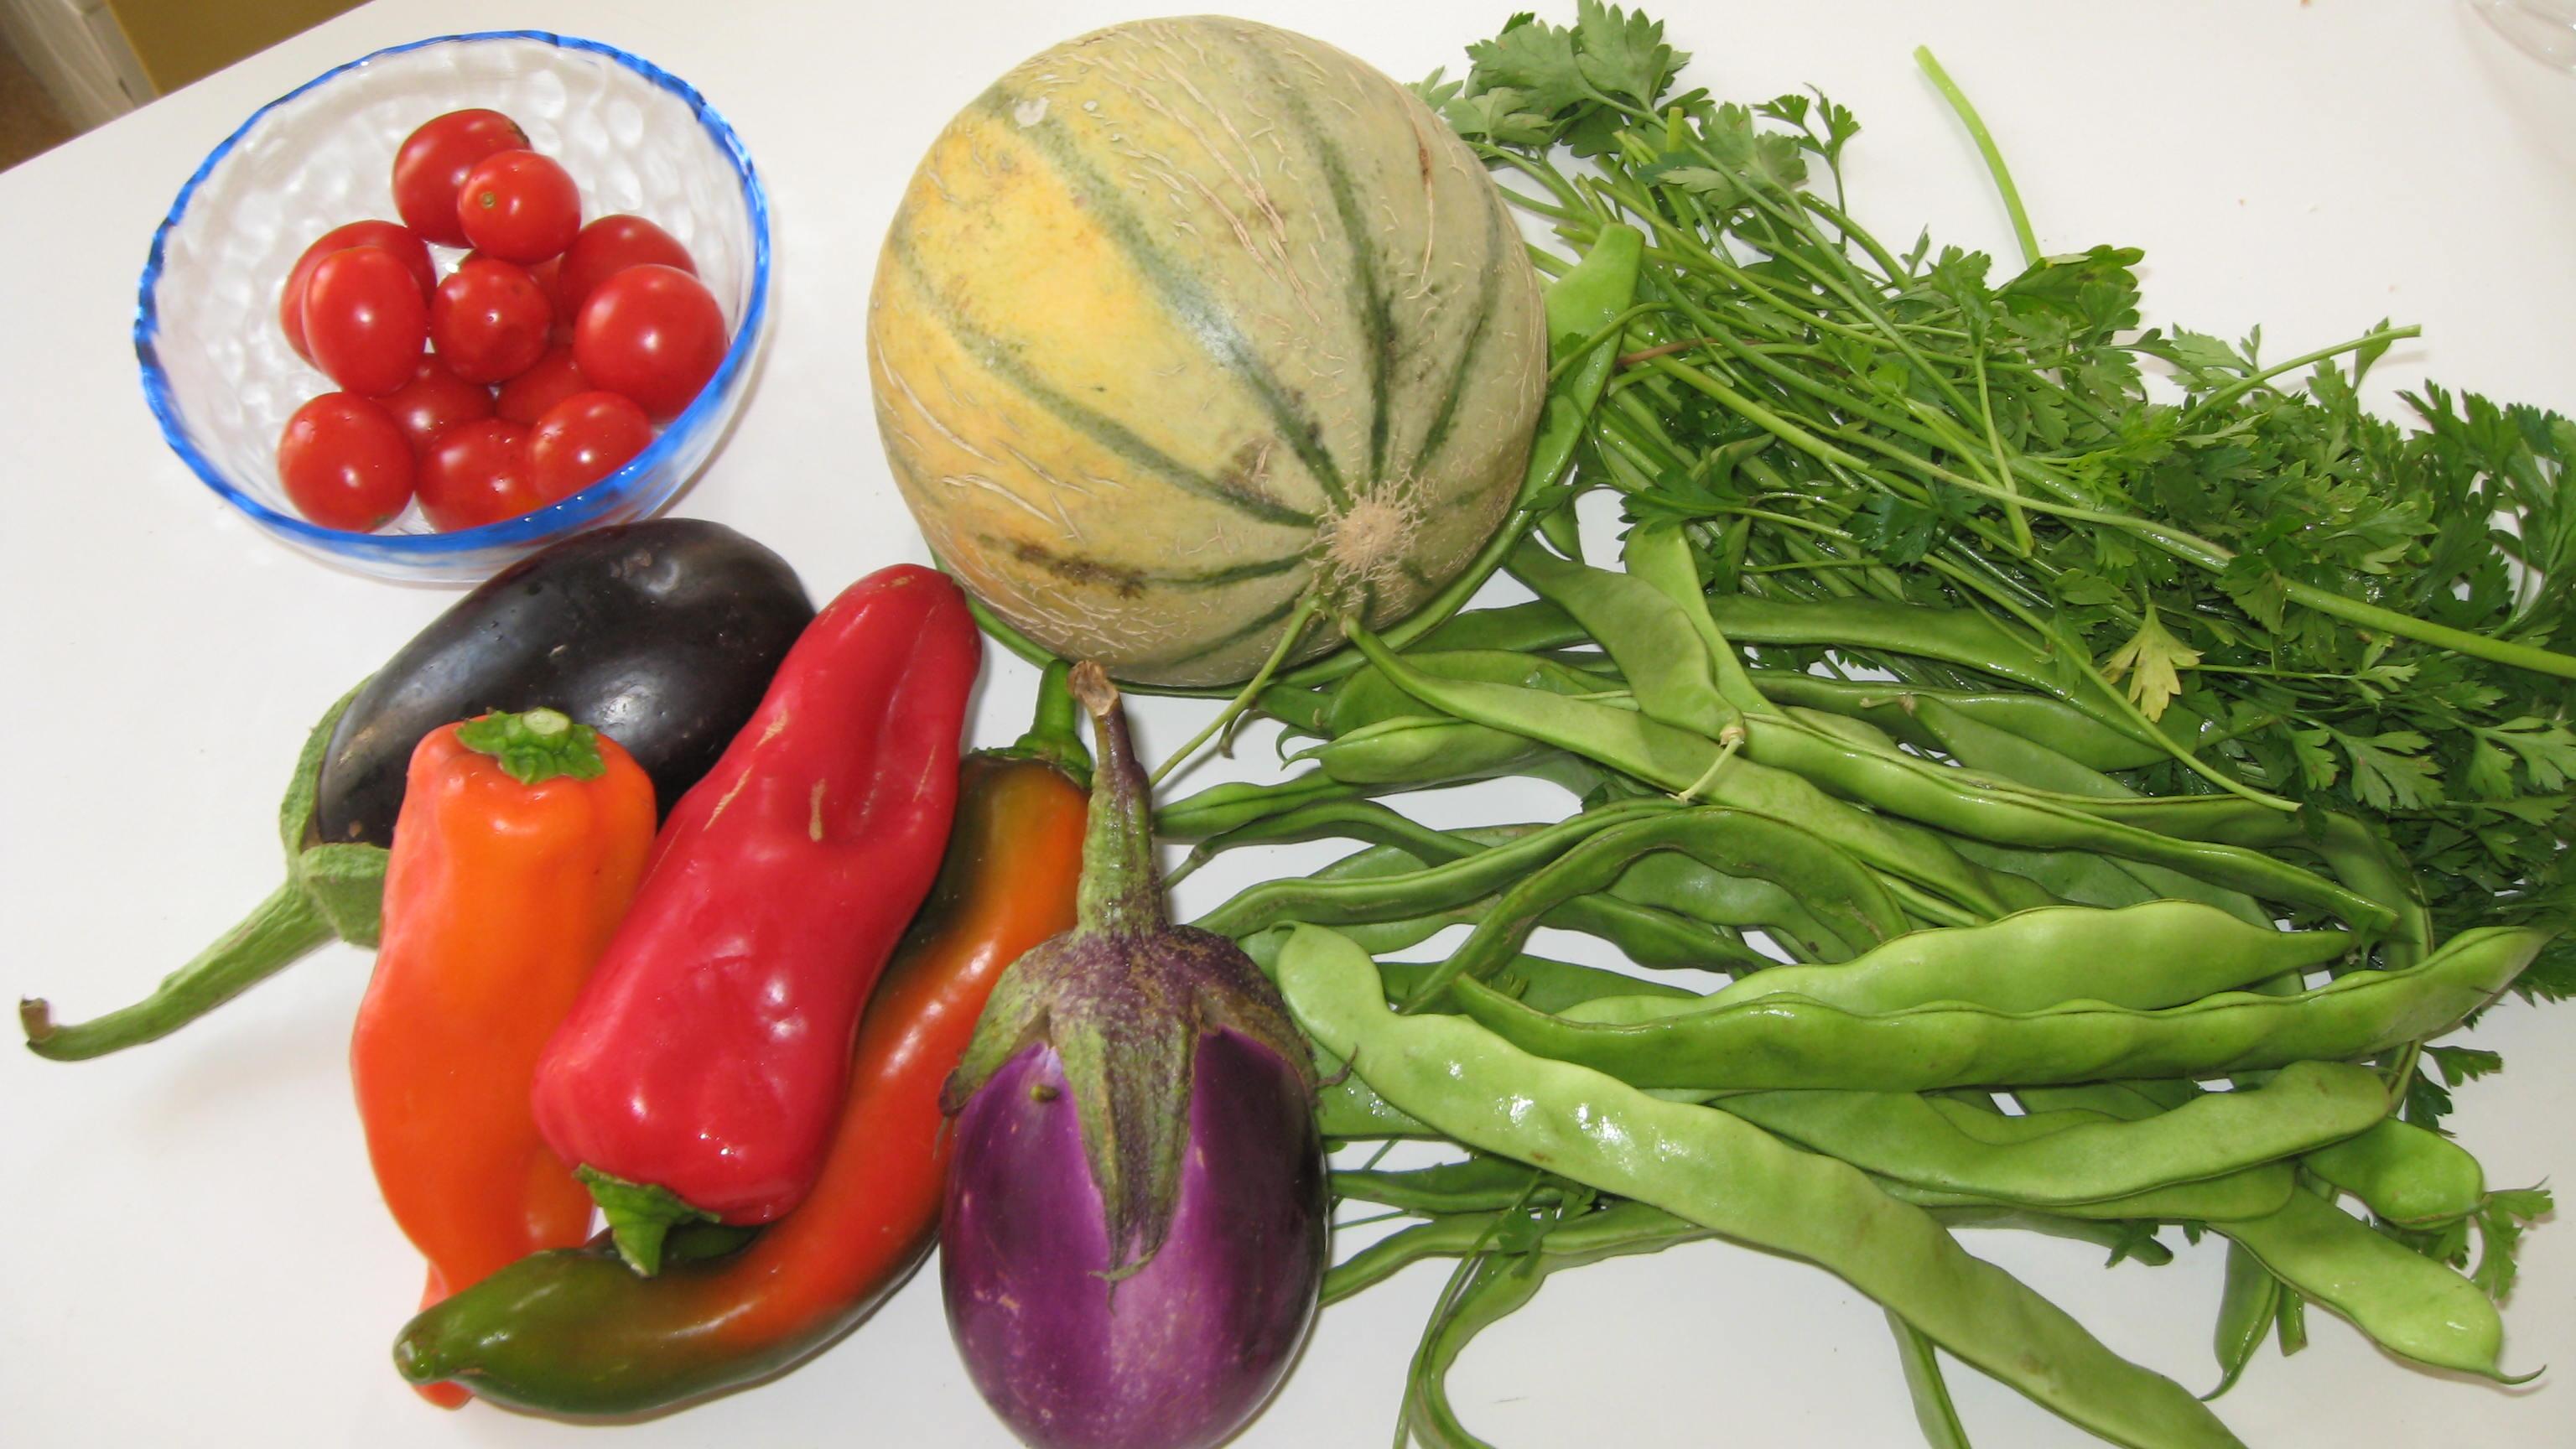 10-1 produce